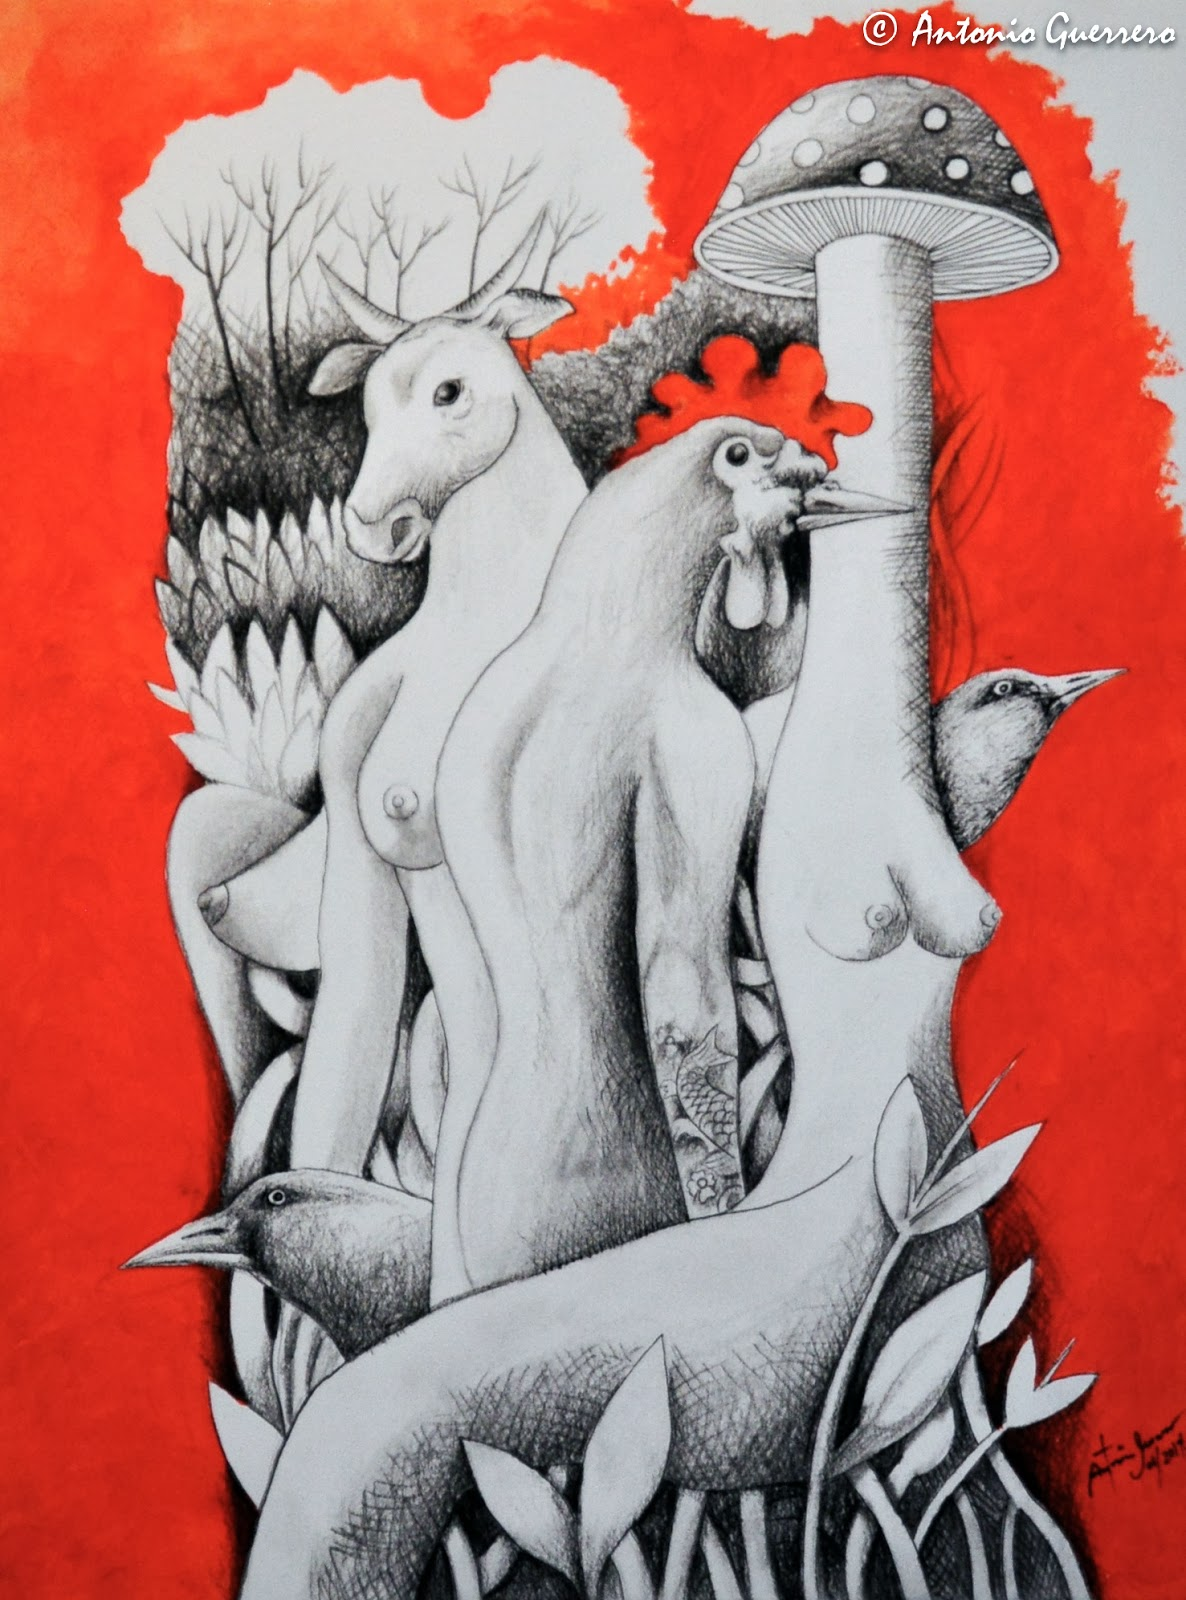 Nudes red garden by Alberto Mendez